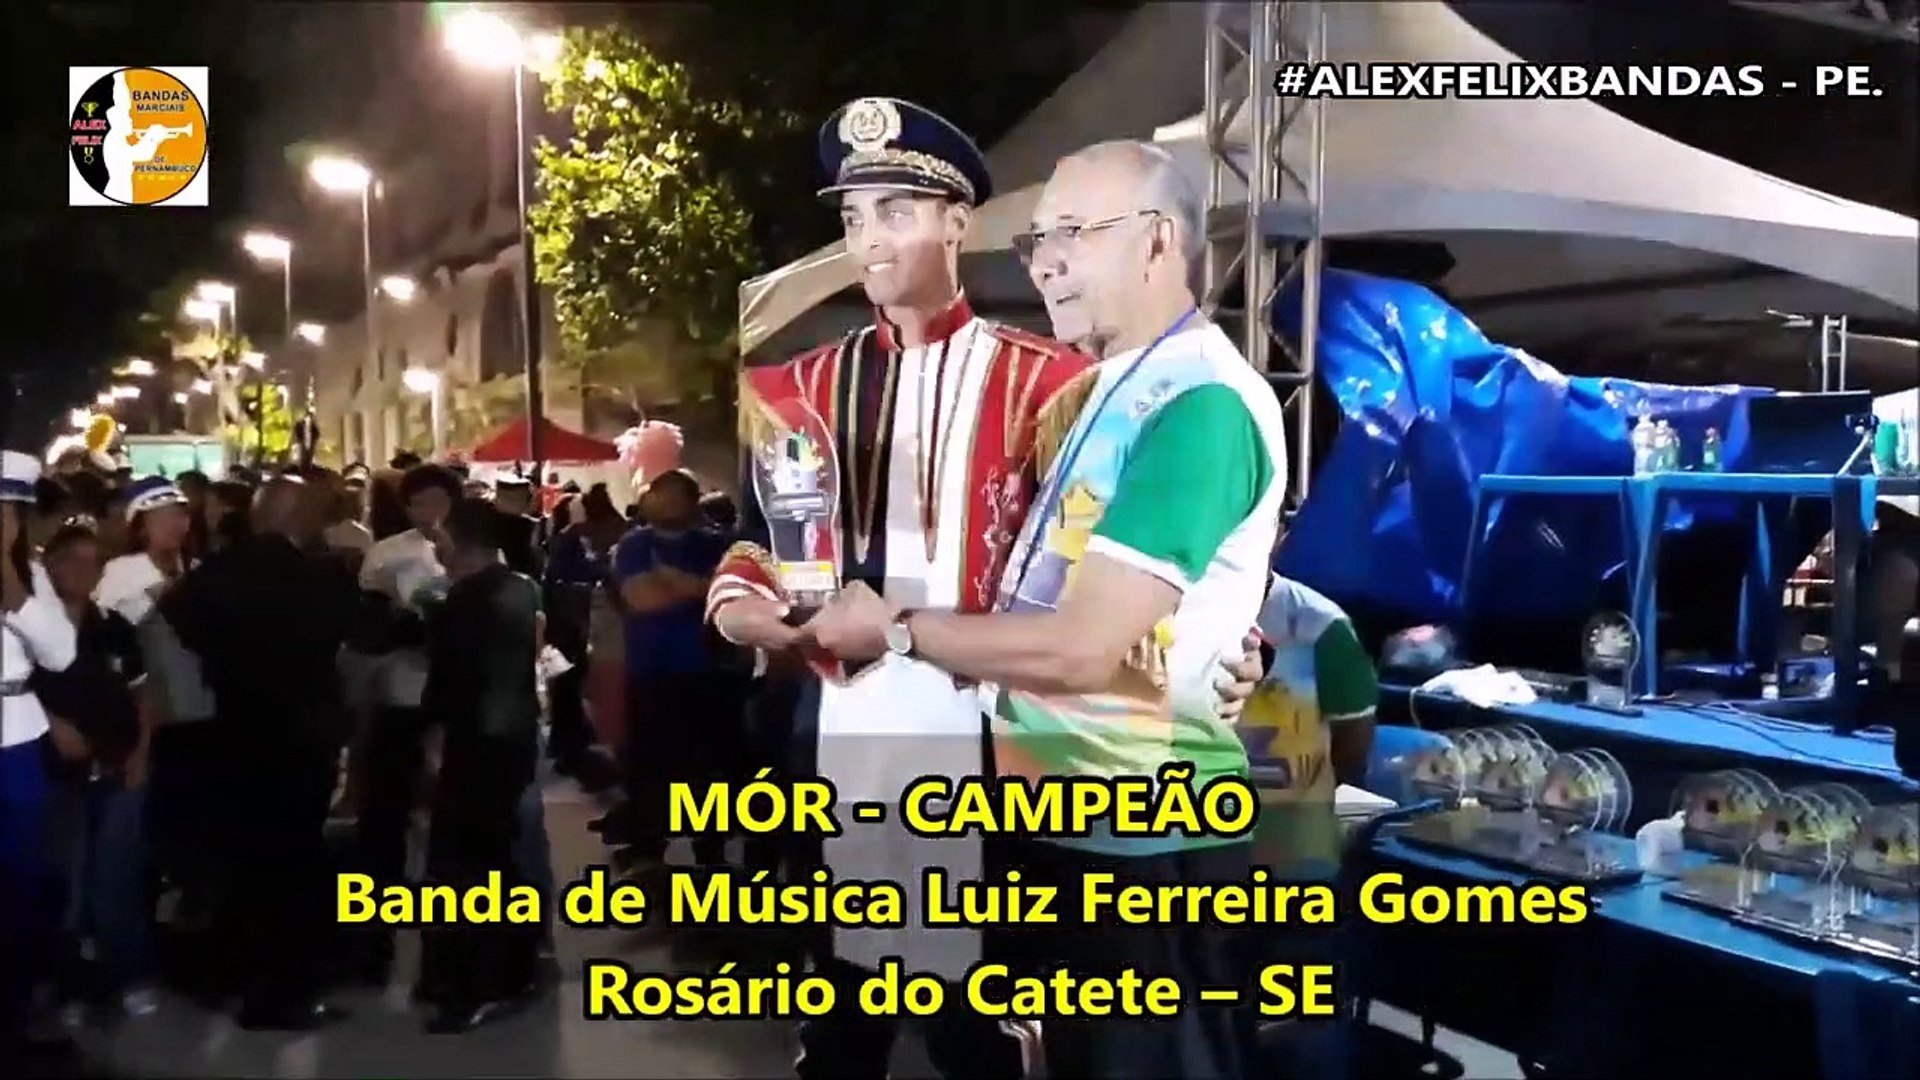 CNBF - 2018 - RESULTADO BANDA MUSICAL DE MARCHA SÊNIOR - CAMPEONATO NACIONAL DE BANDAS E FANFARRAS